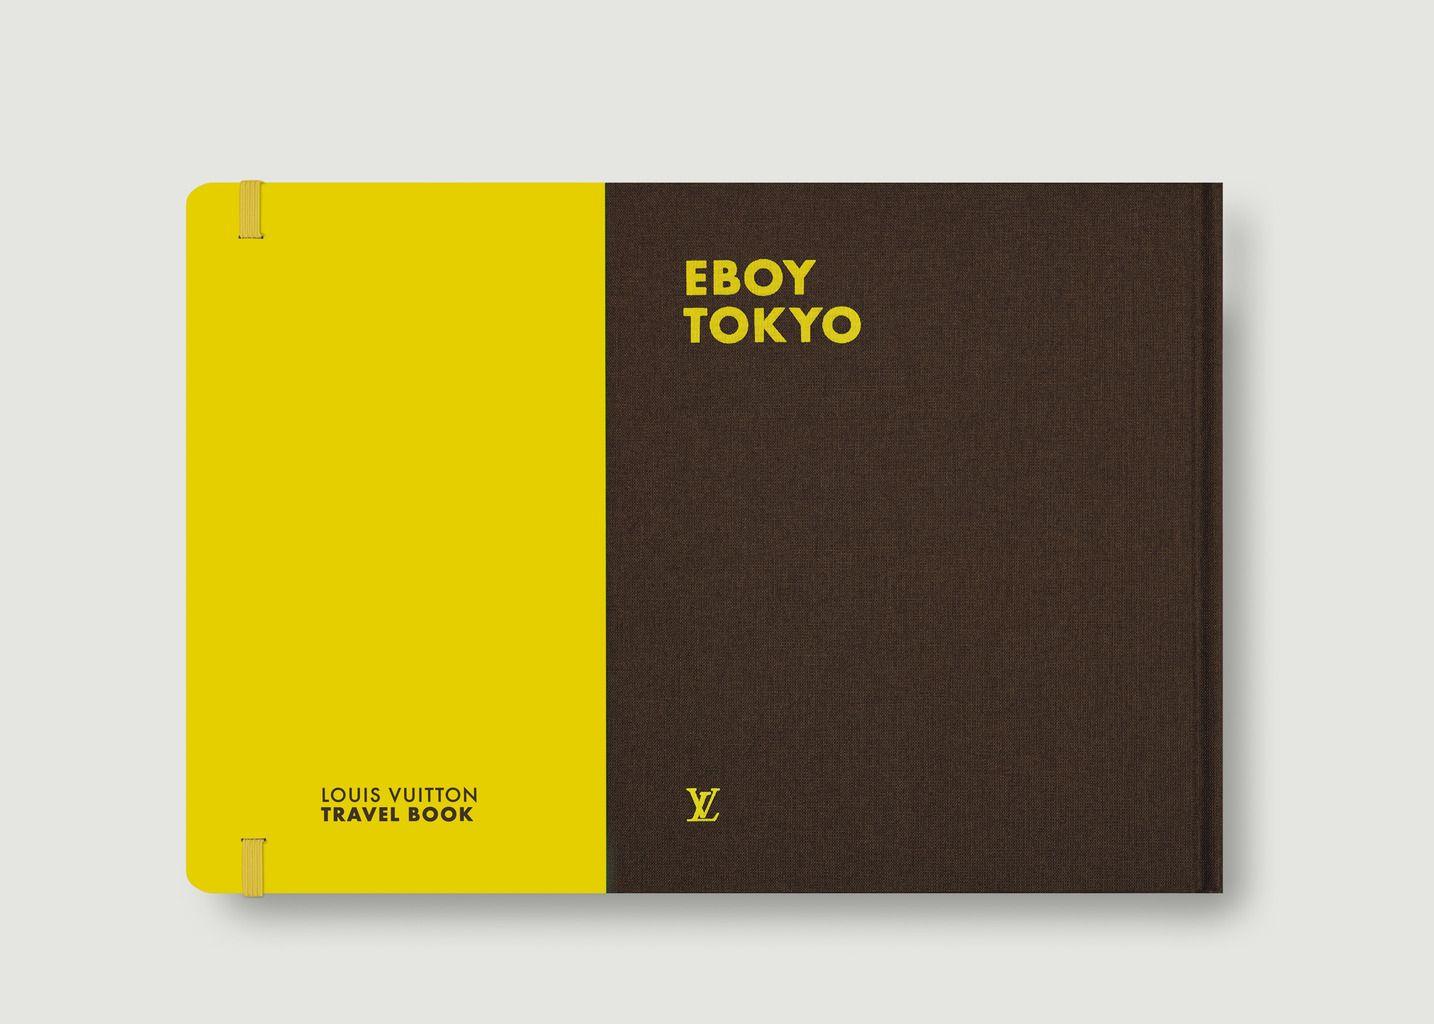 Livre Travel Book Tokyo - Louis Vuitton Travel Book